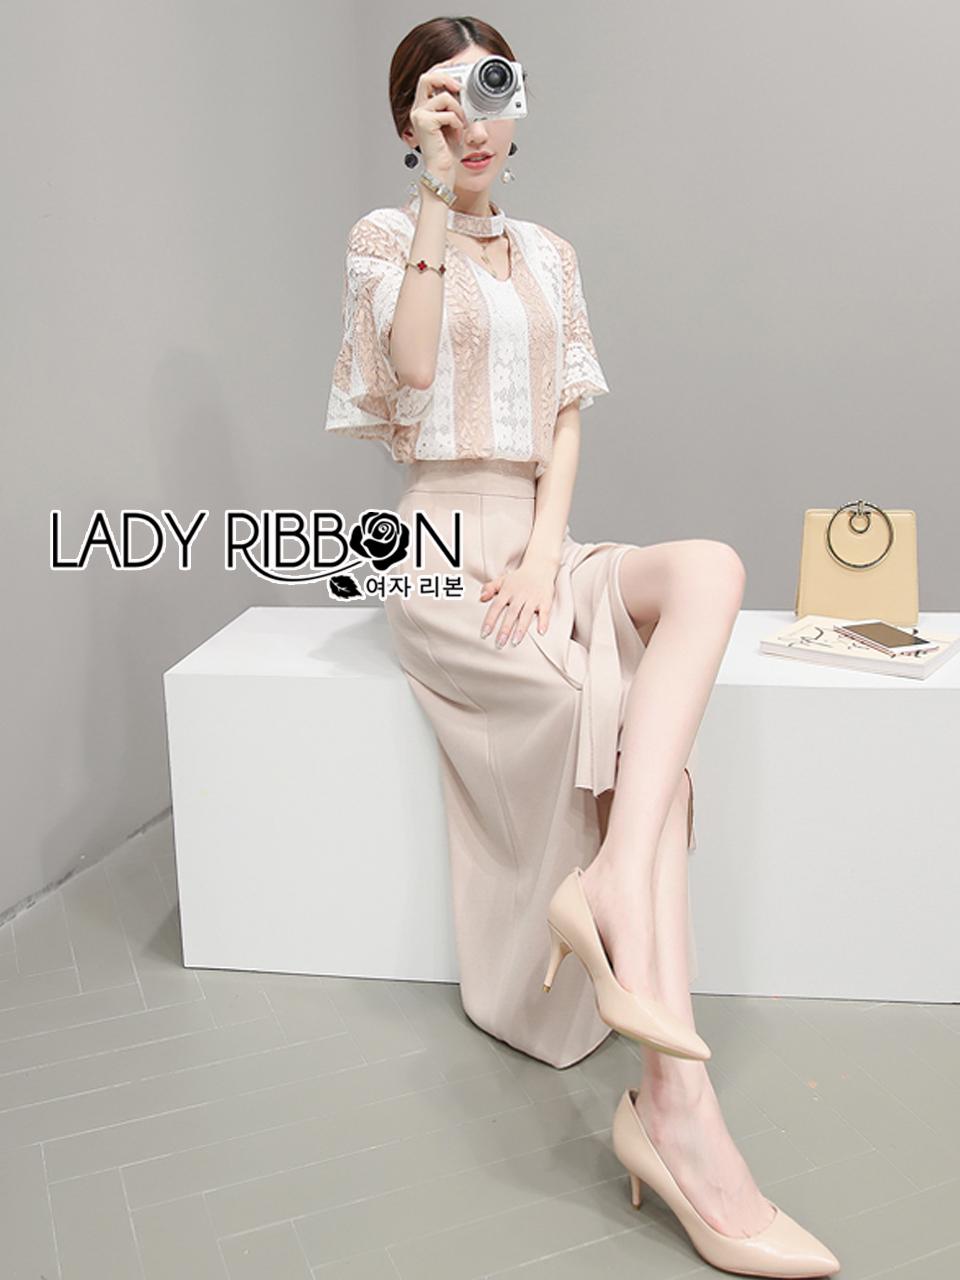 Lady Ribbon's Made &#x1F380 Lady Lizzie Cut-Out Striped Lace Top and Beige Culottes Set เซ็ตเสื้อลูกไม้ลายทางทรงคัทเอาท์และกางเกงขากว้างสีเบจ ลุคนี้เป็นสาวเรียบร้อย ใส่ไปทำงานแบบง่ายๆแต่ดูเก๋ ตัวเสื้อเป็นทรงสุดฮิต คัทเอาท์ช่วงคอเหมือนสายคาดchokerสุดฮ